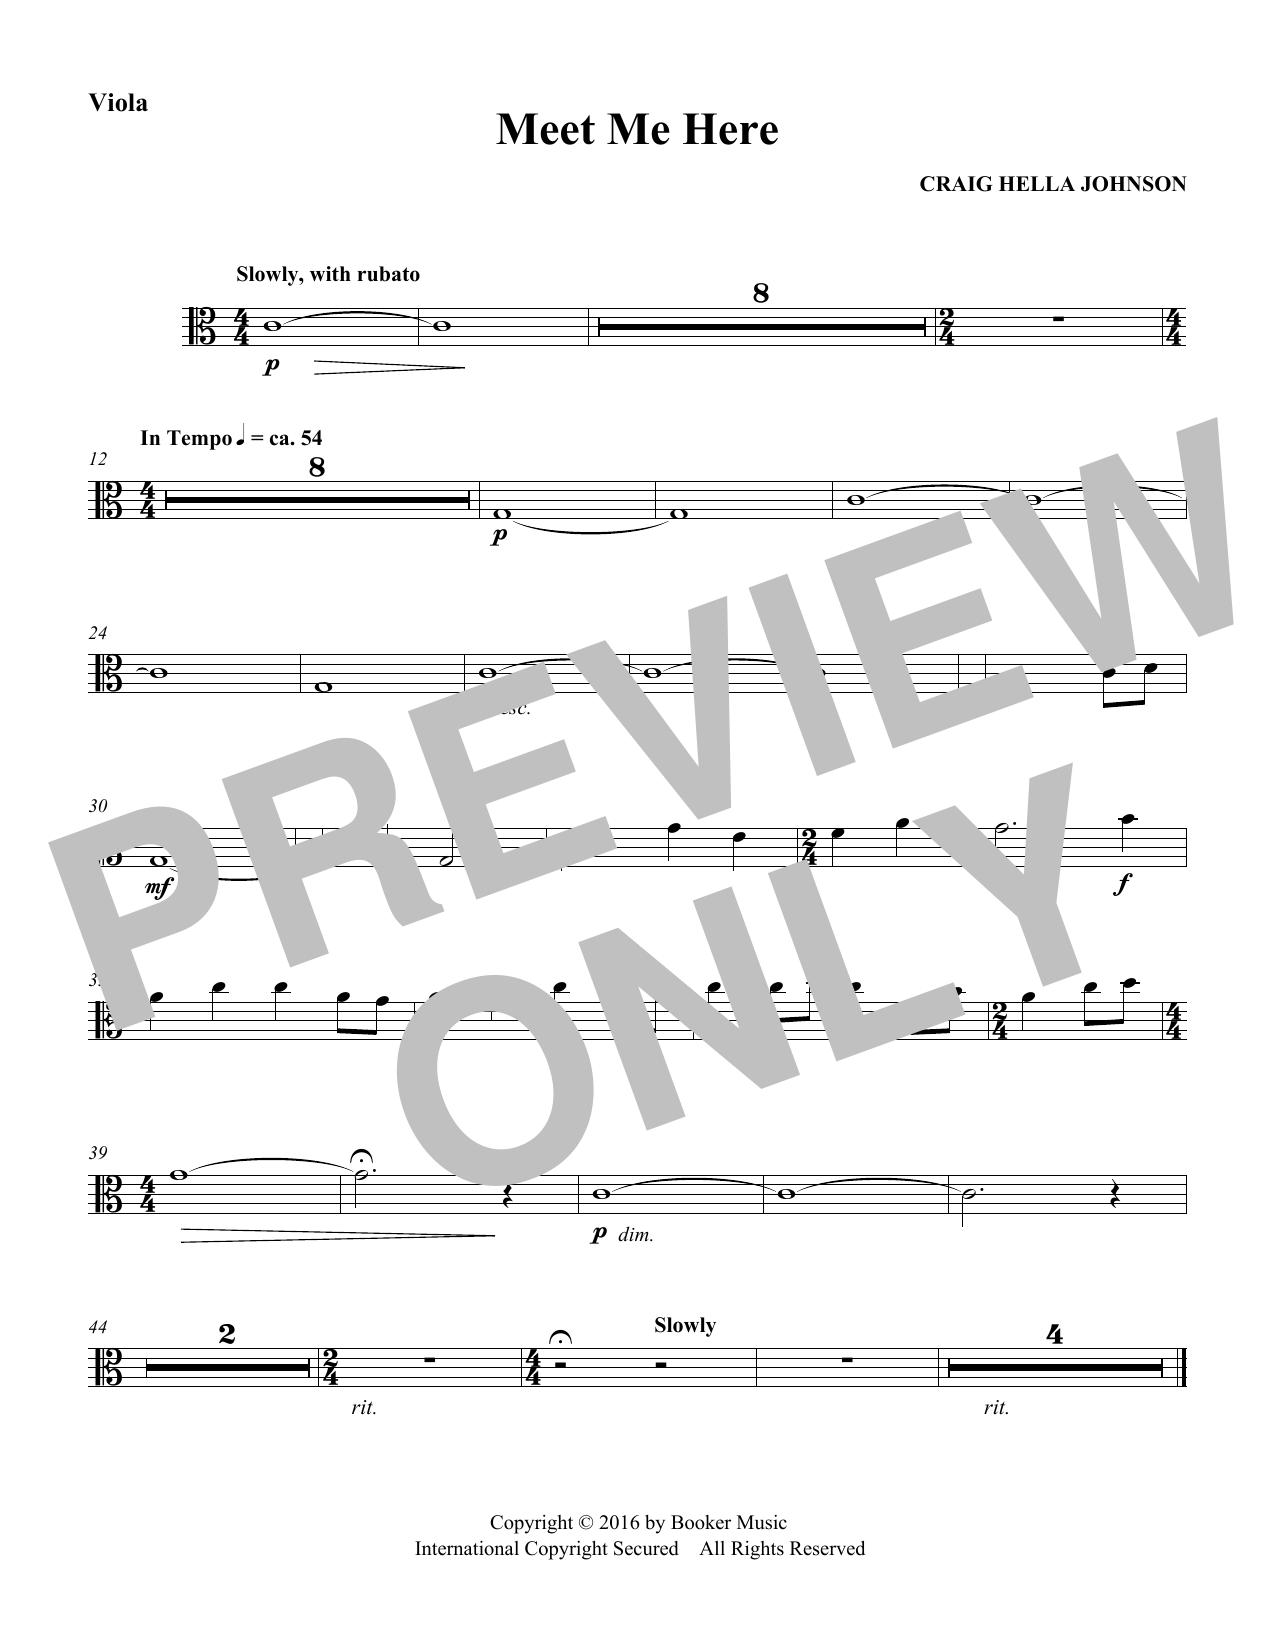 Meet Me Here (from Considering Matthew Shepard) - Viola Sheet Music